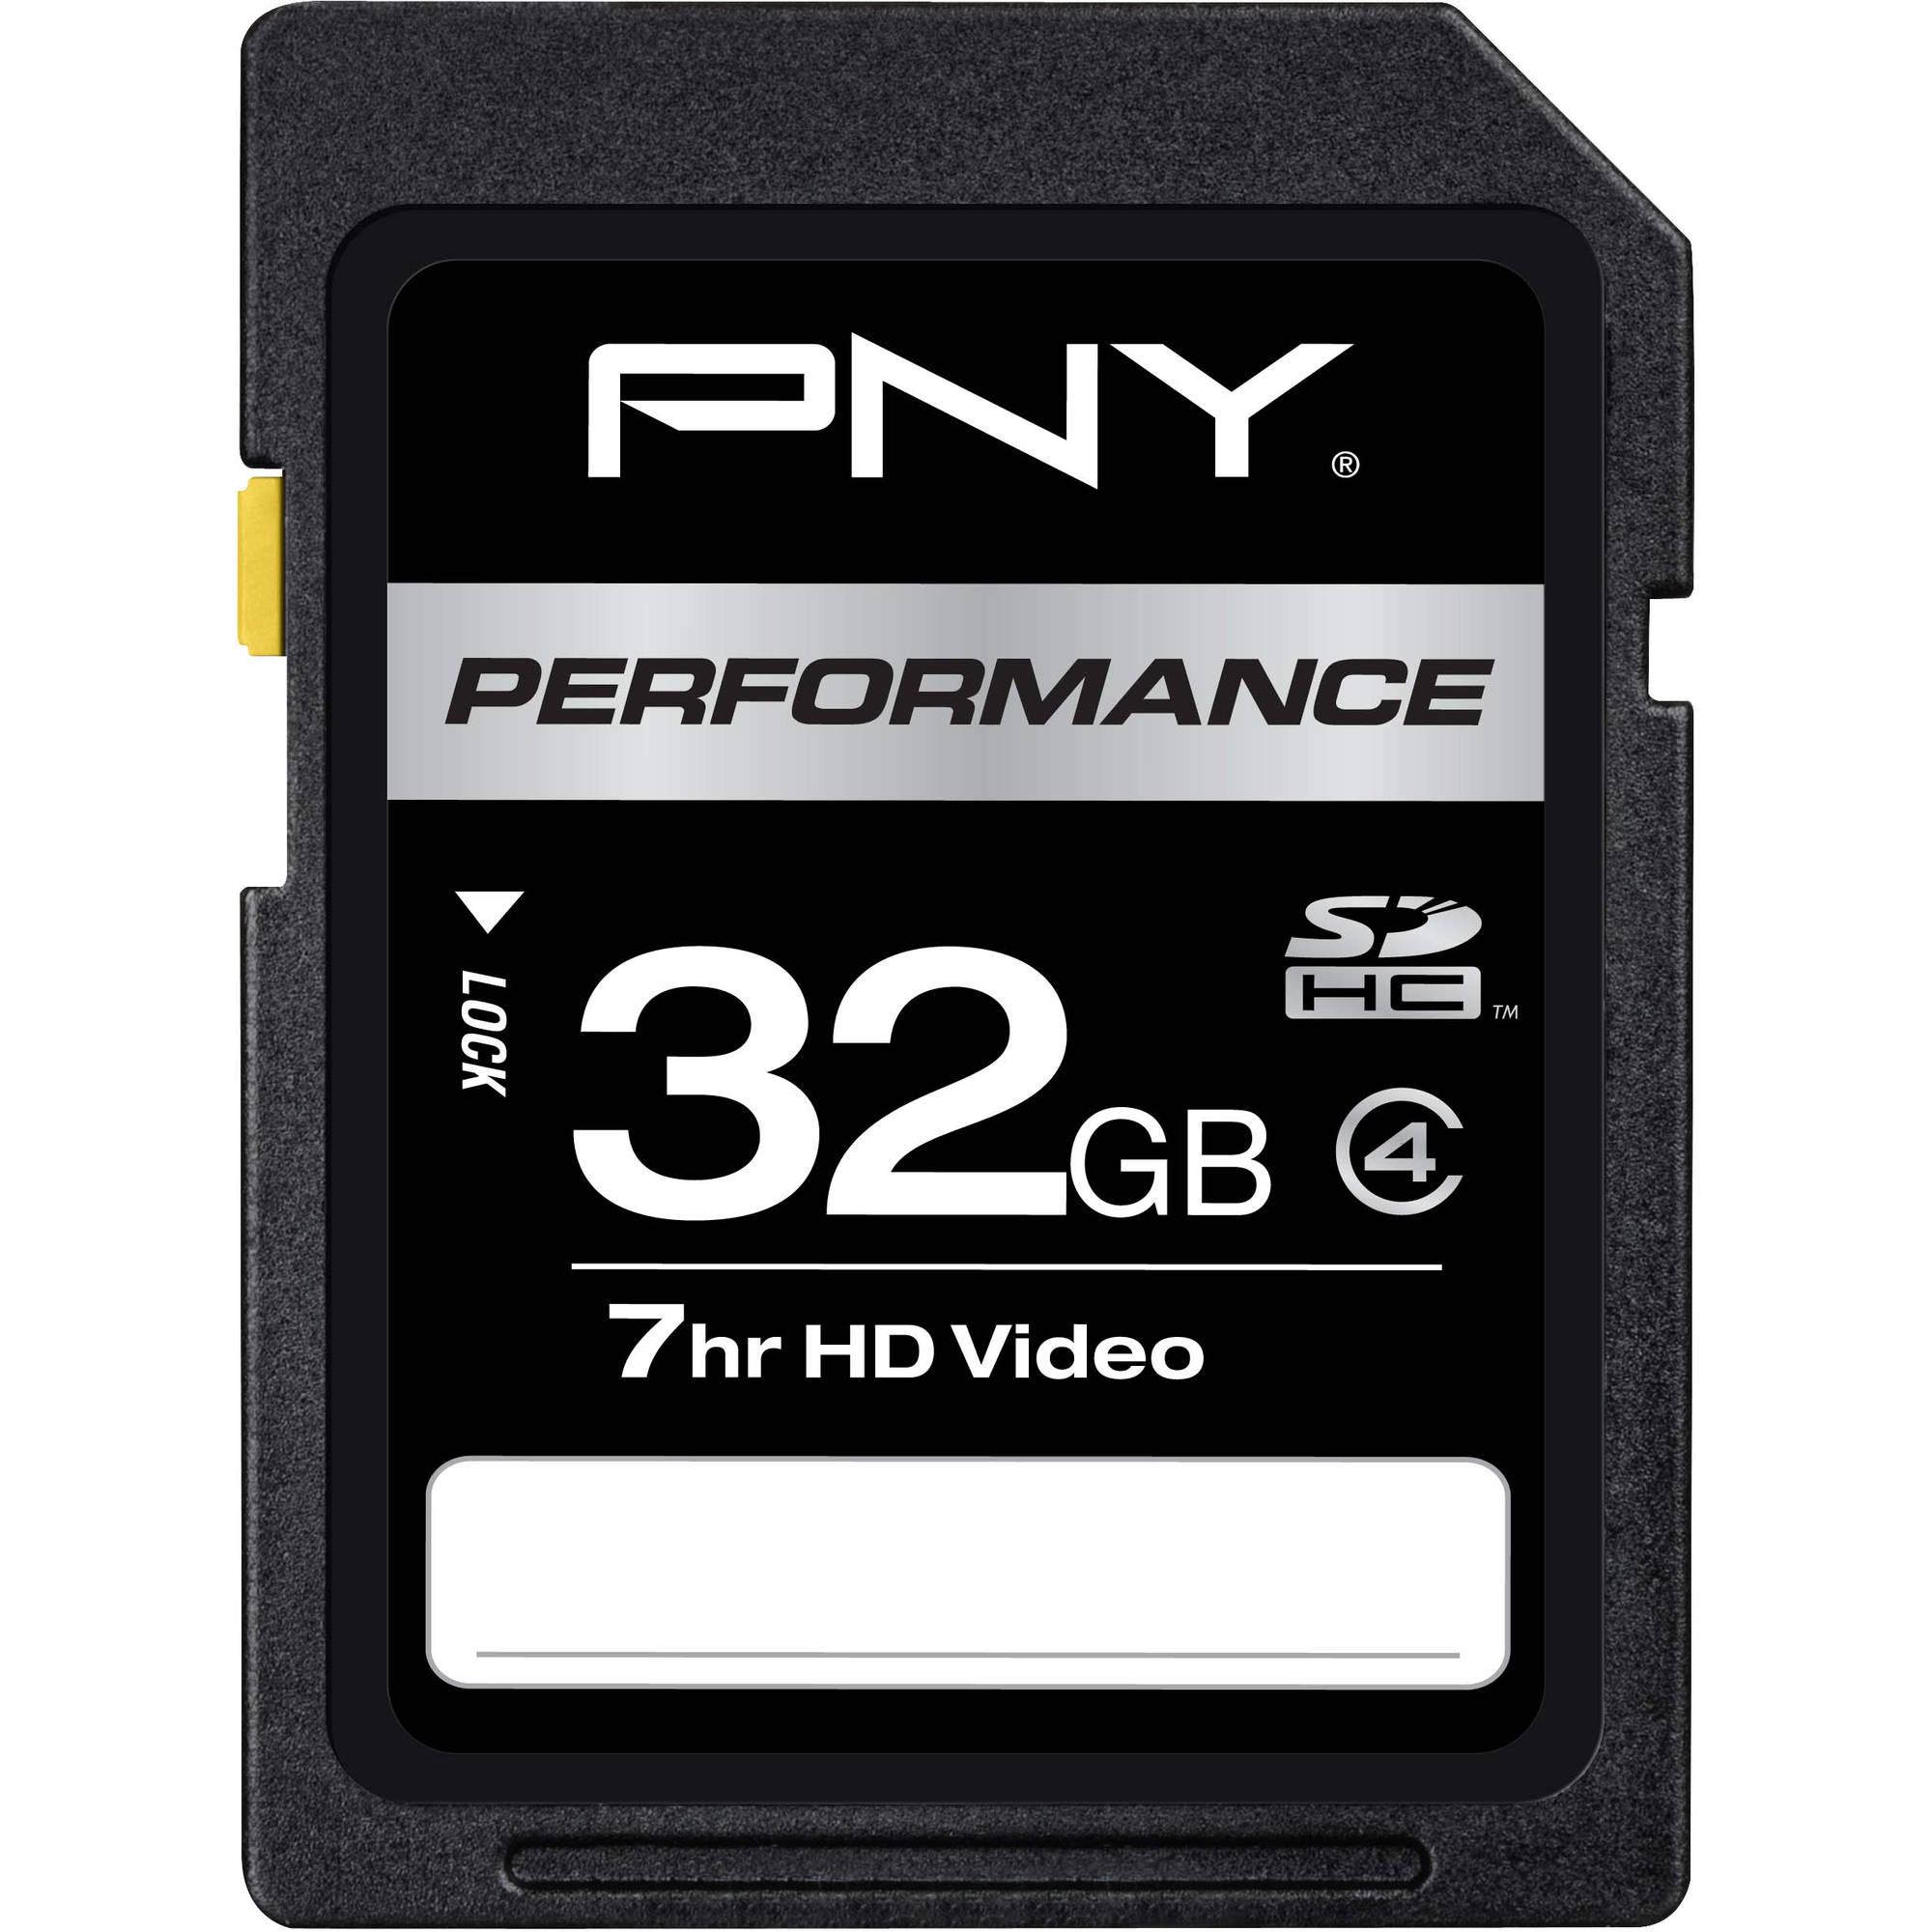 PNY Technologies 32GB Class 4 SDHC Card